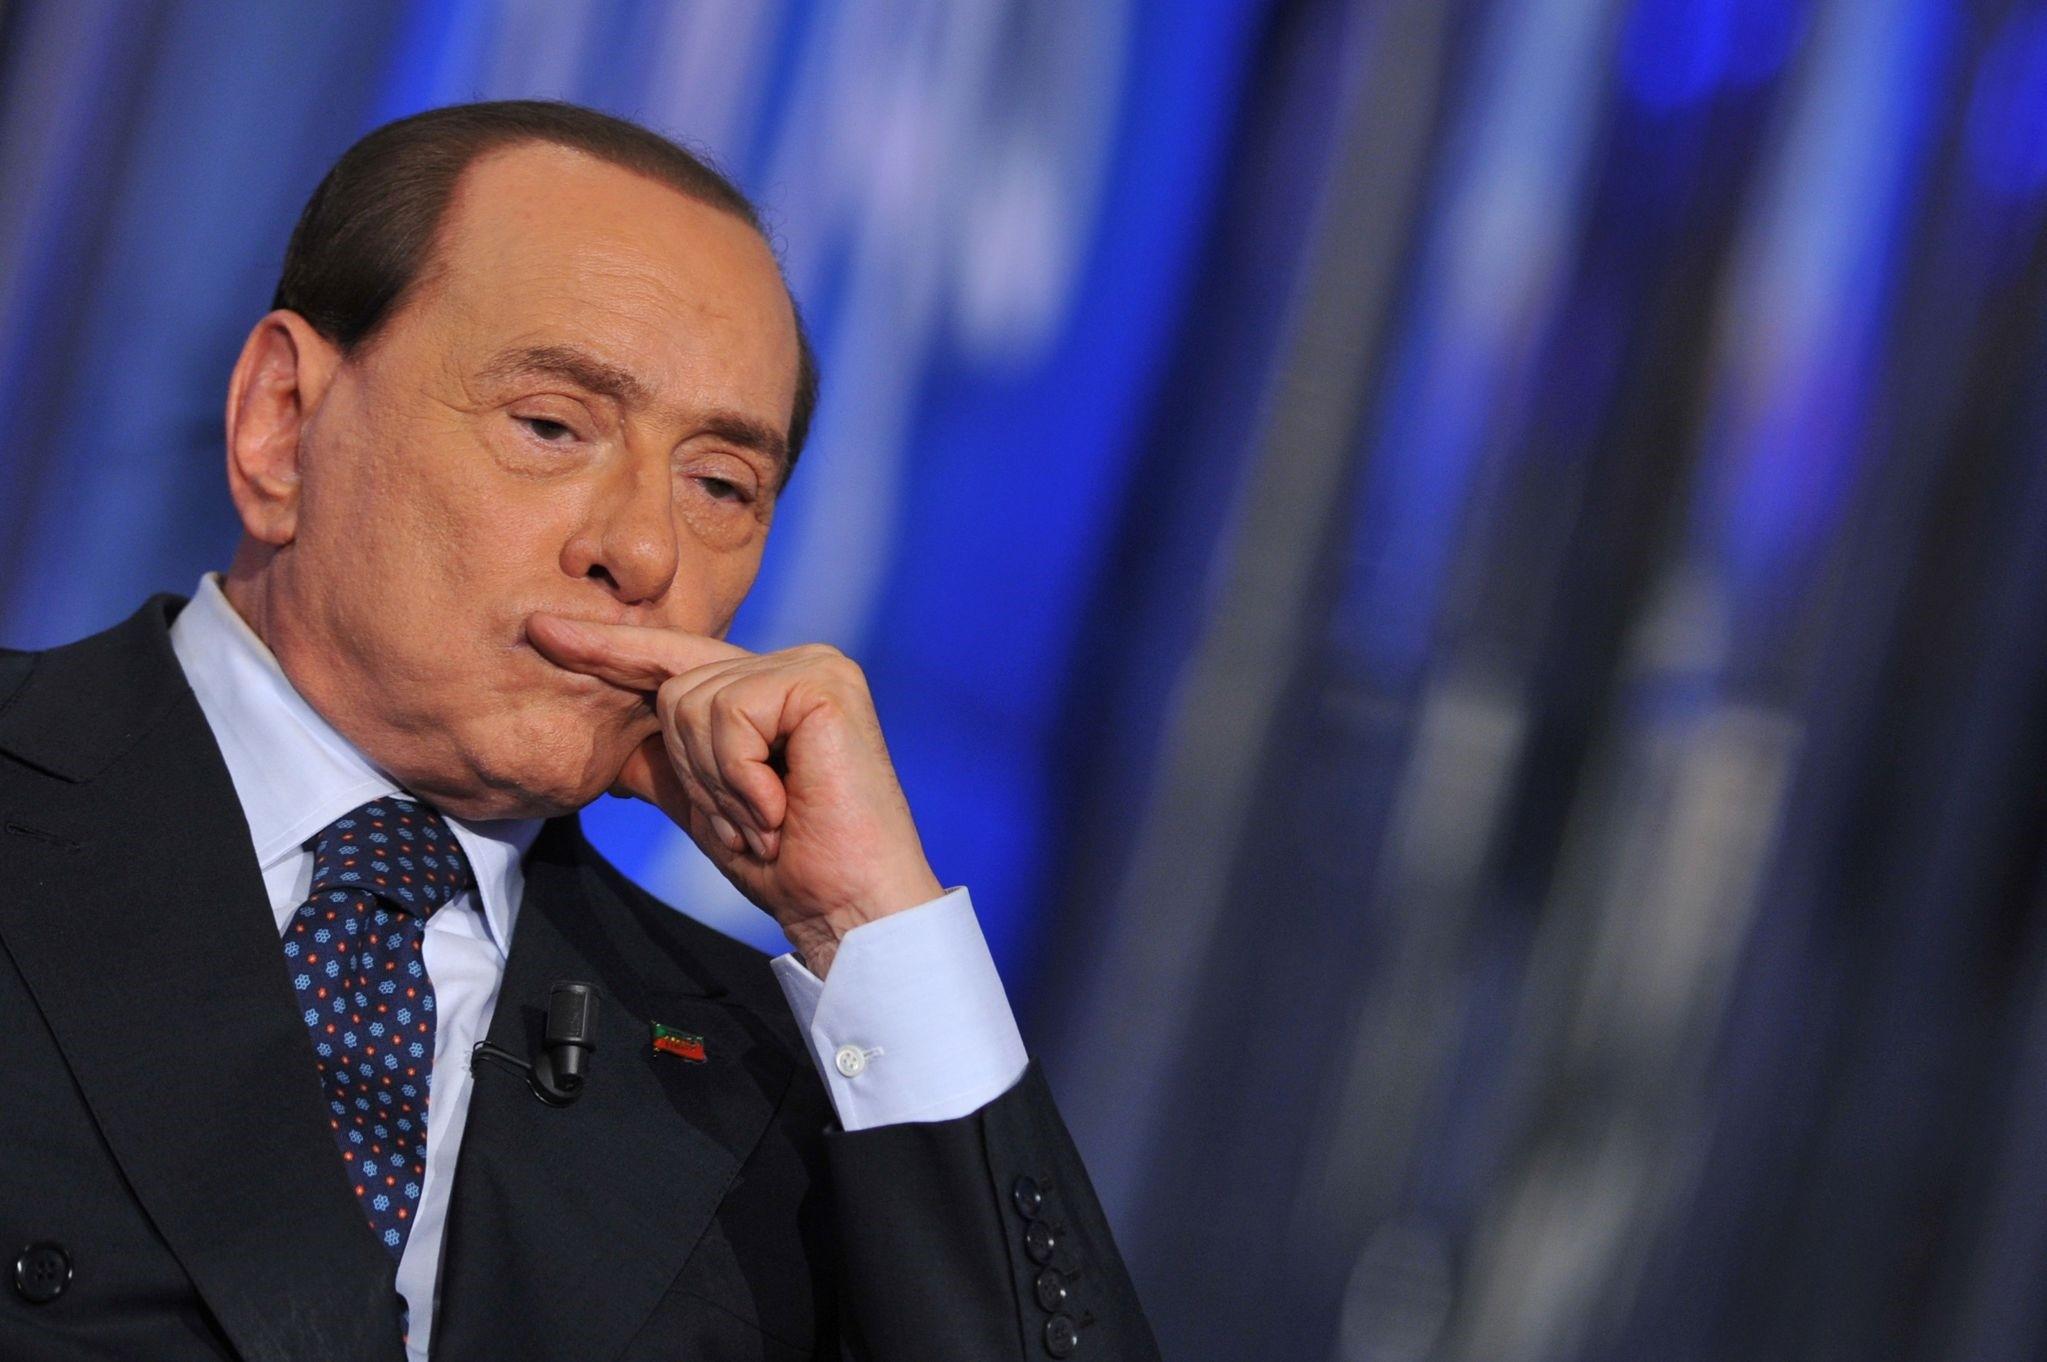 Italian former Prime Minister Silvio Berlusconi attending the ,Porta a Porta, TV show at the Rai 1 headquarters.  (AFP Photo)